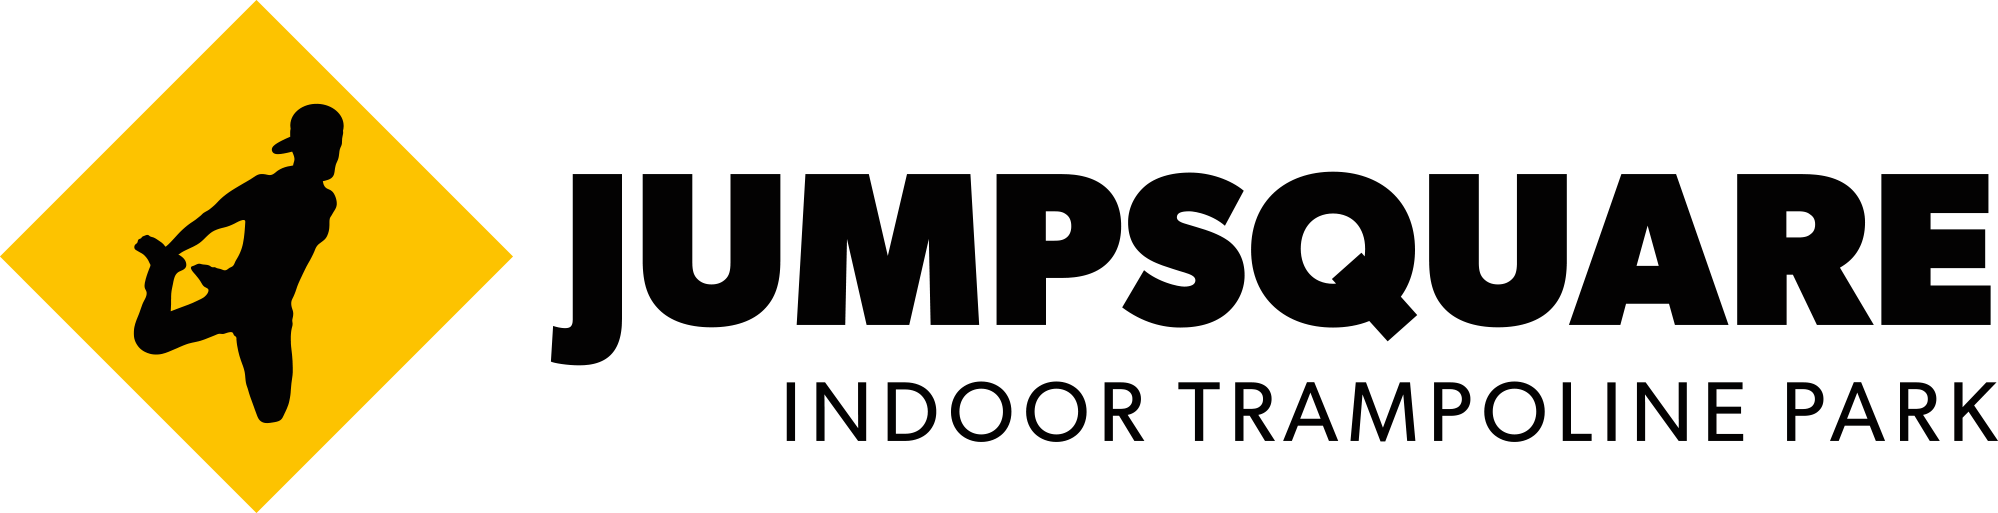 Jumpsquare logo